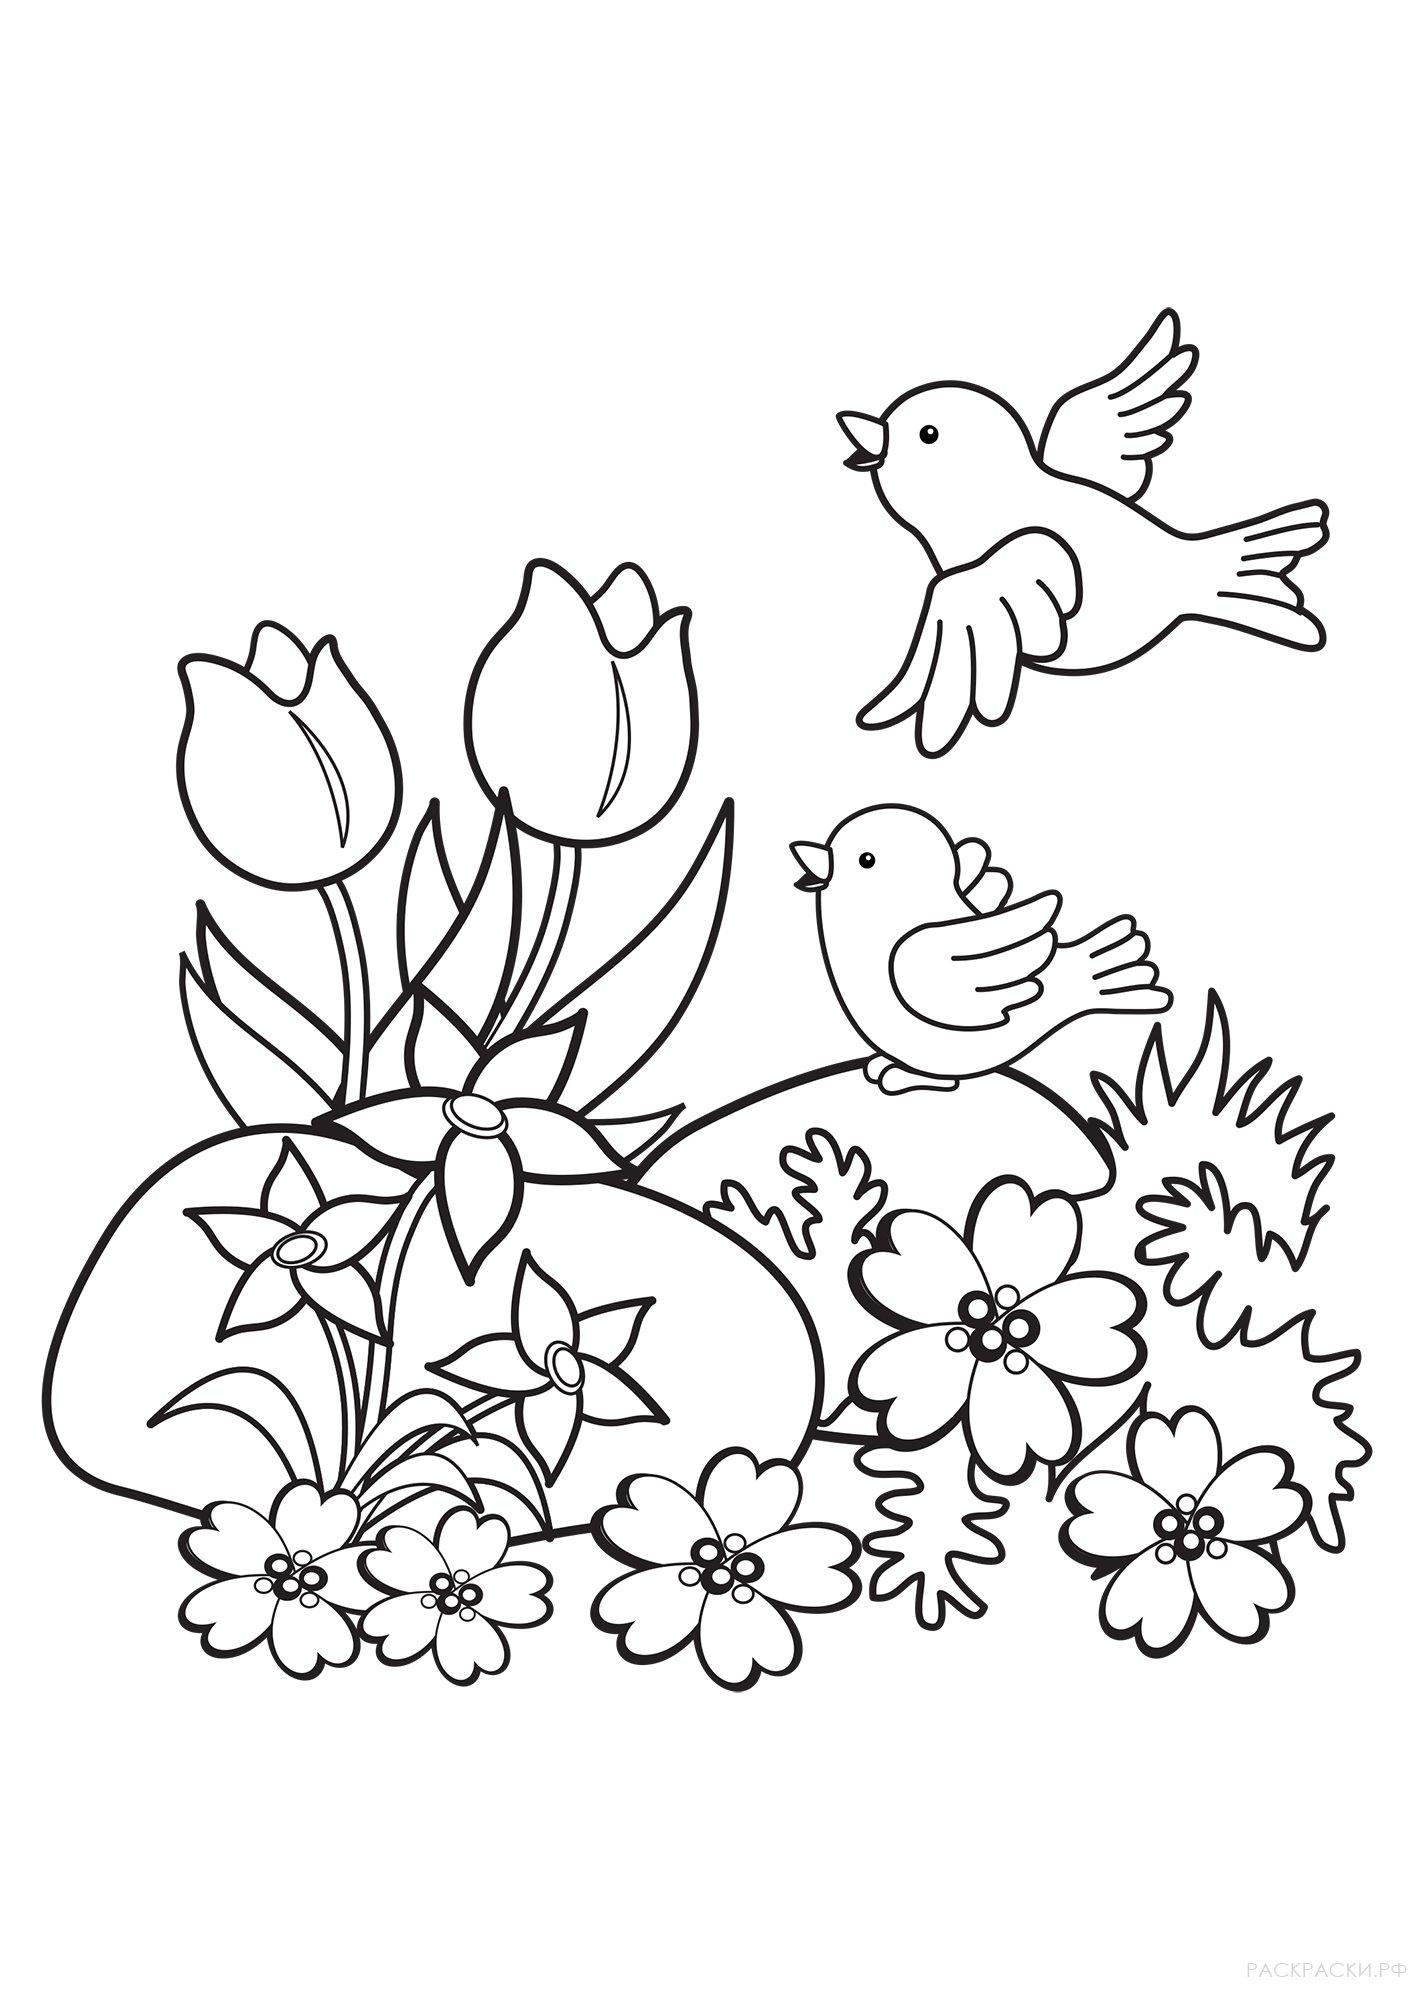 Раскраска Птицы и цветы